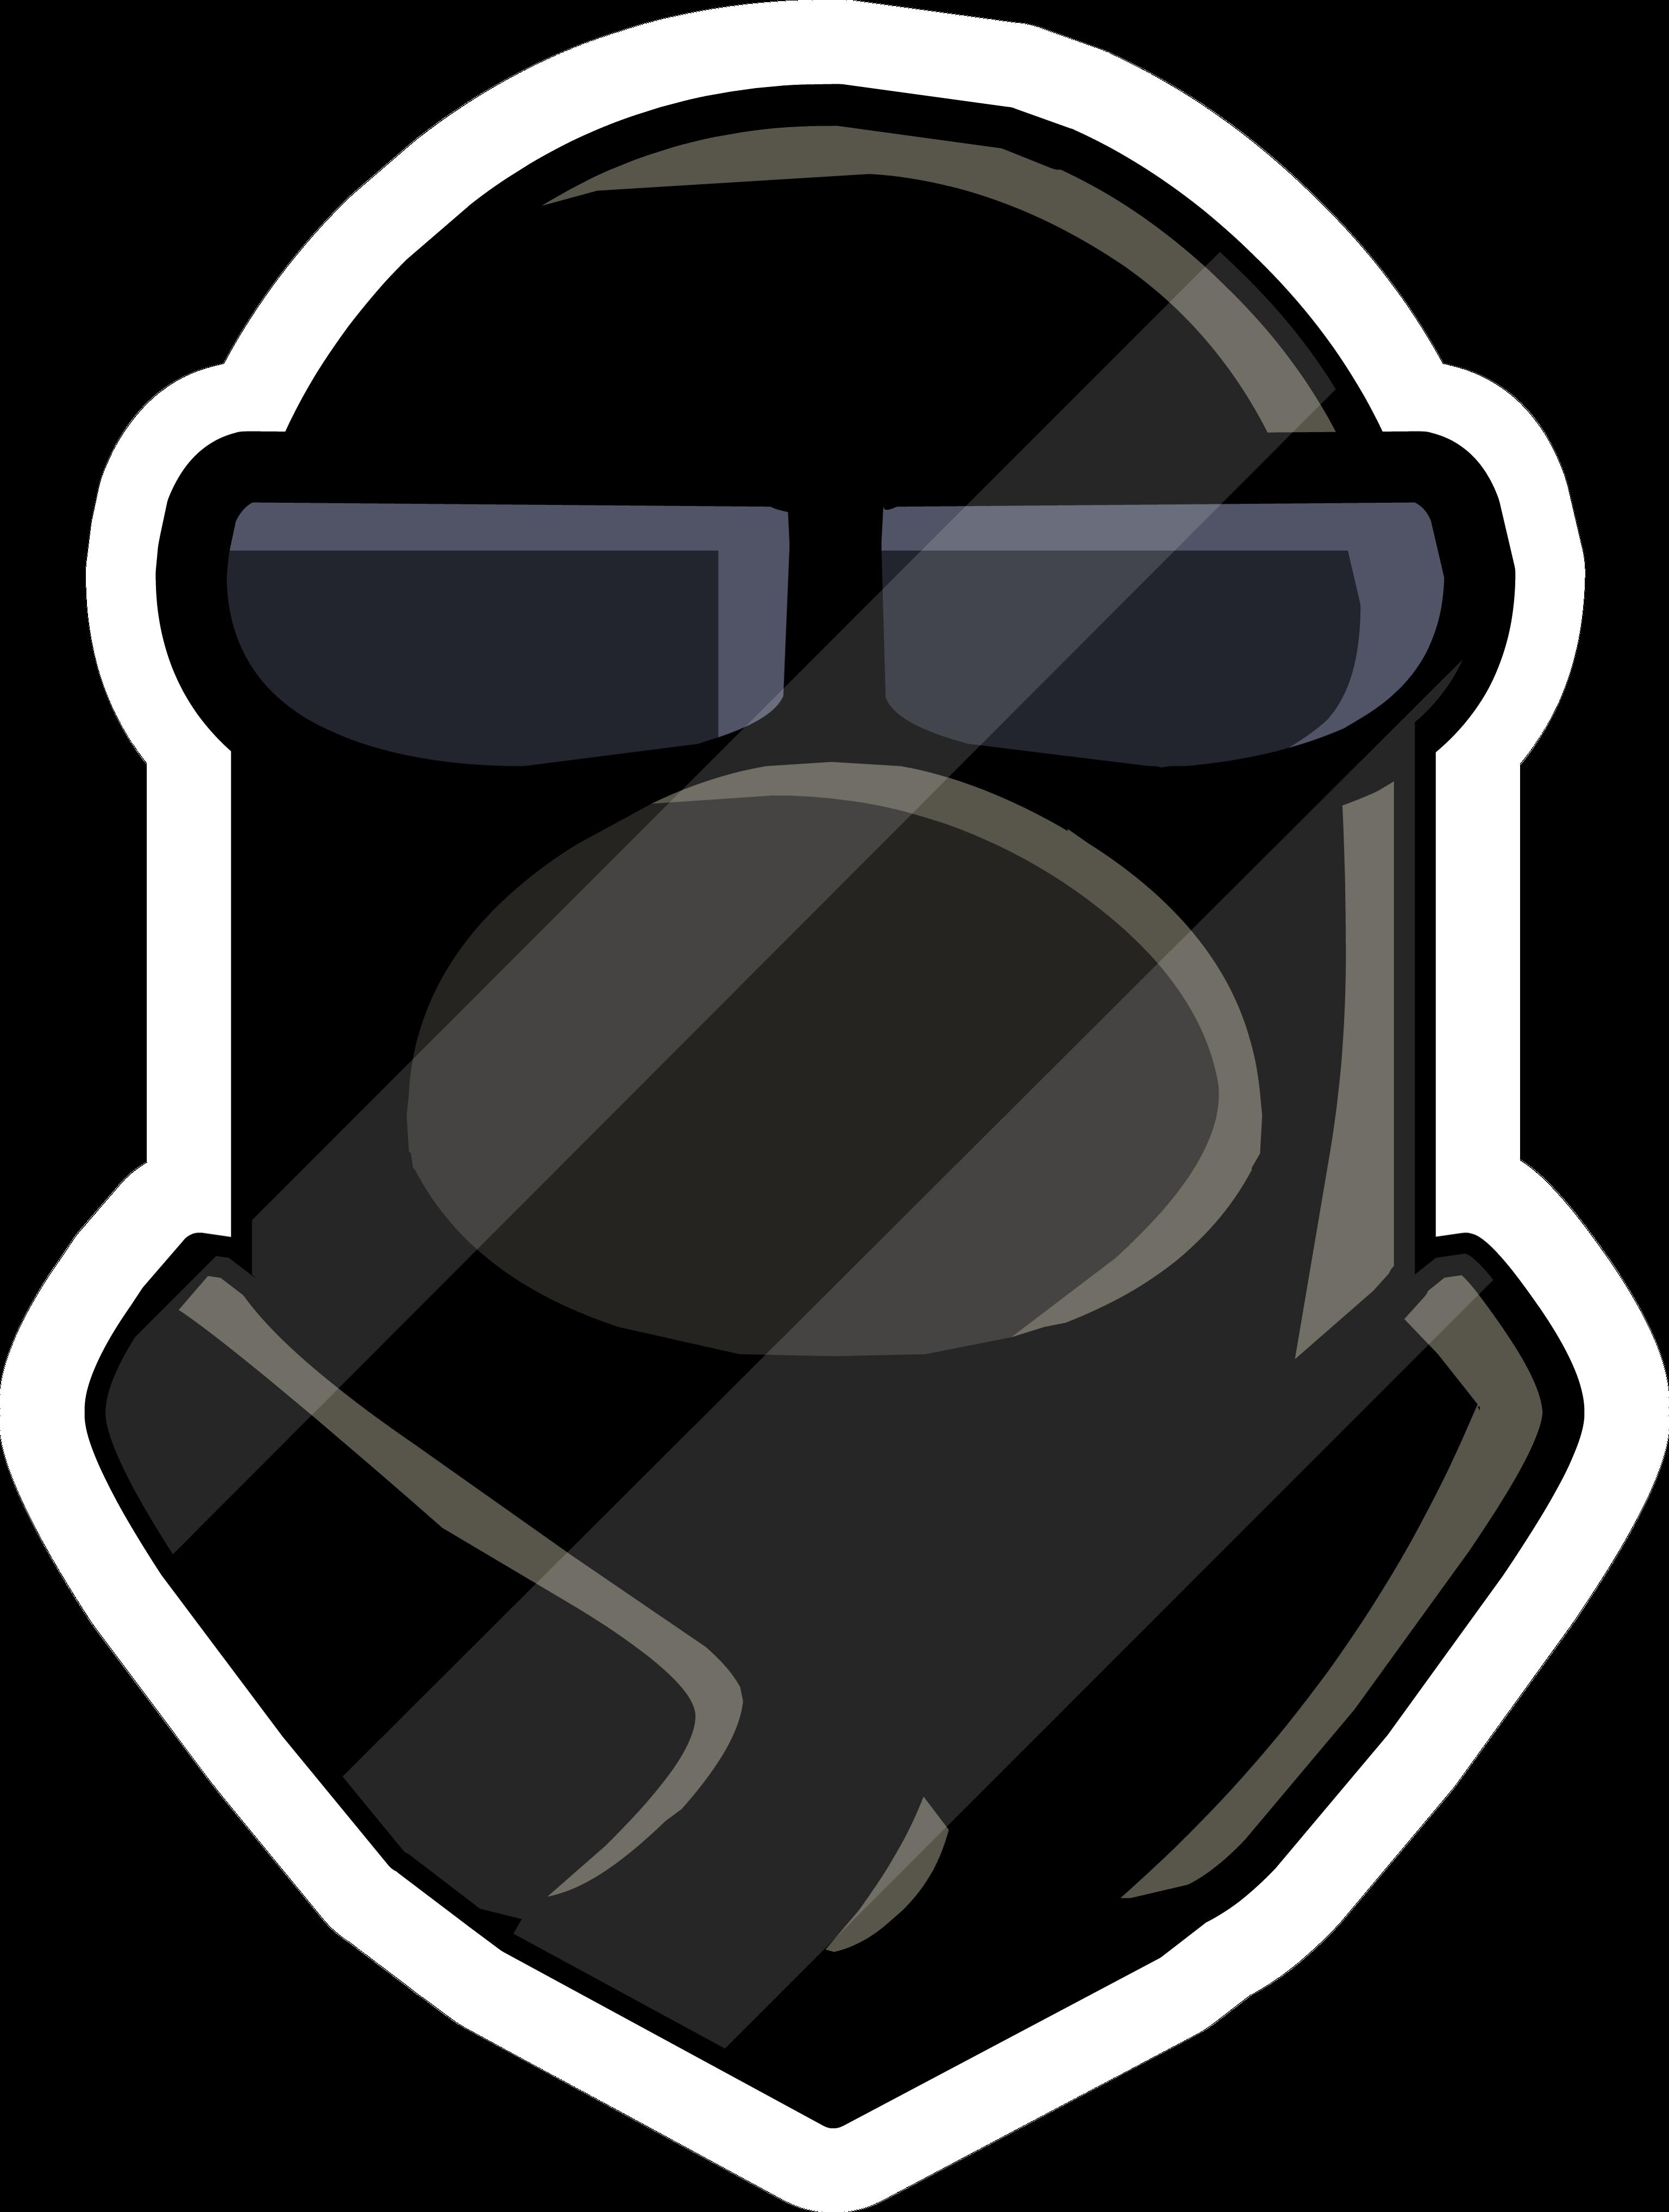 Star wars rebel helmet clipart vector transparent stock Memory Book | Club Penguin Wiki | FANDOM powered by Wikia vector transparent stock